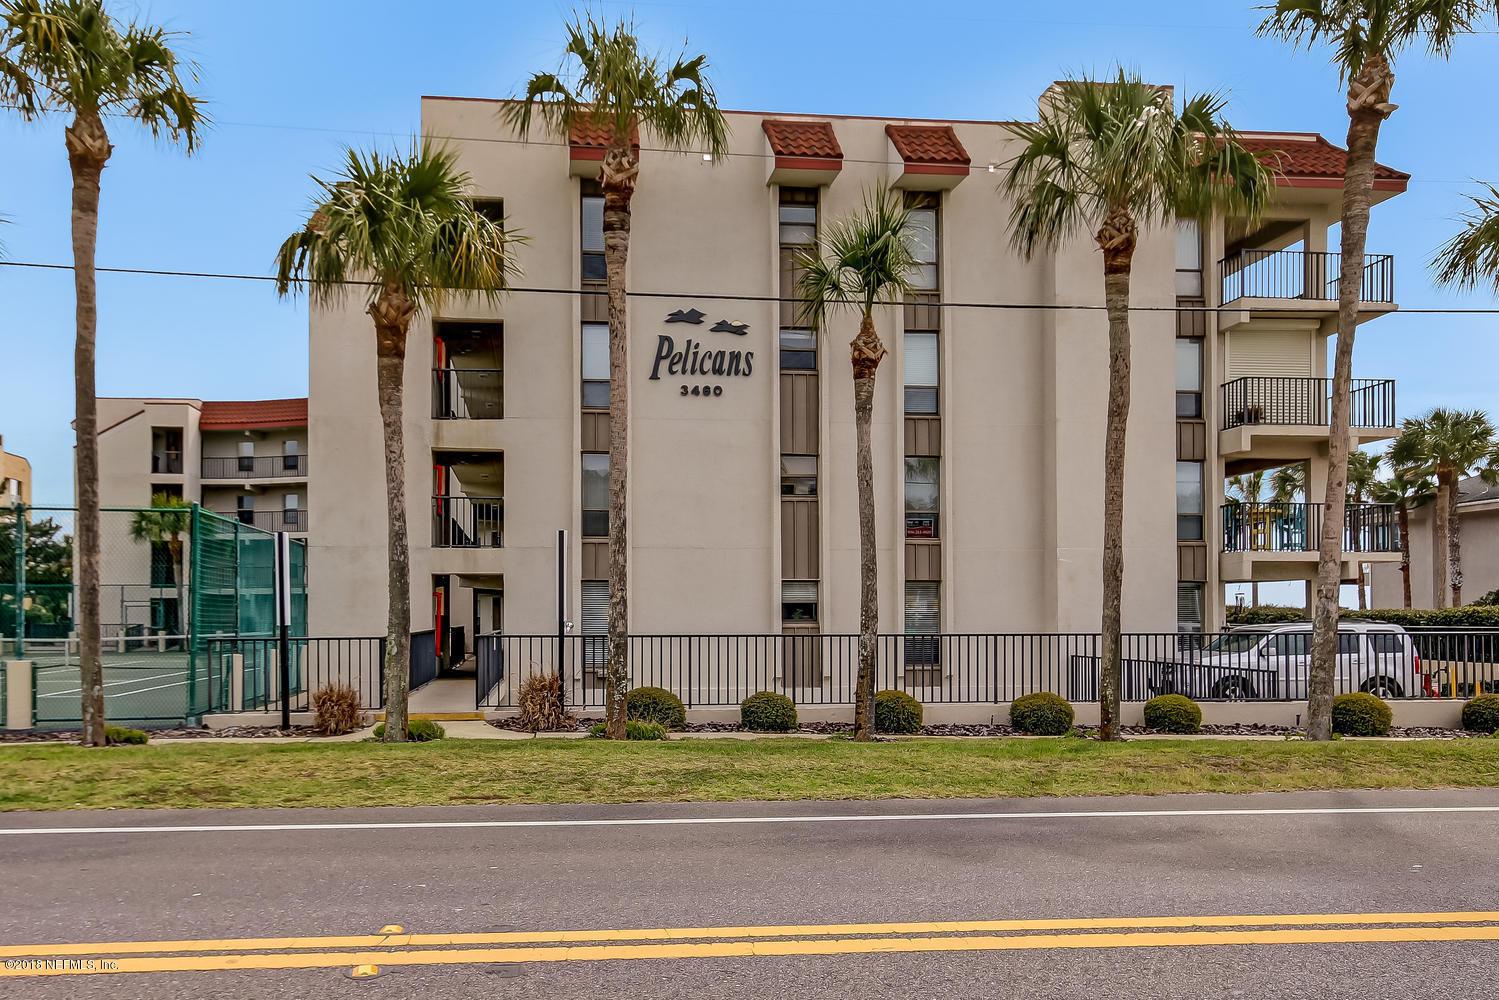 3460 FLETCHER, FERNANDINA BEACH, FLORIDA 32034, 3 Bedrooms Bedrooms, ,2 BathroomsBathrooms,Residential - condos/townhomes,For sale,FLETCHER,957751